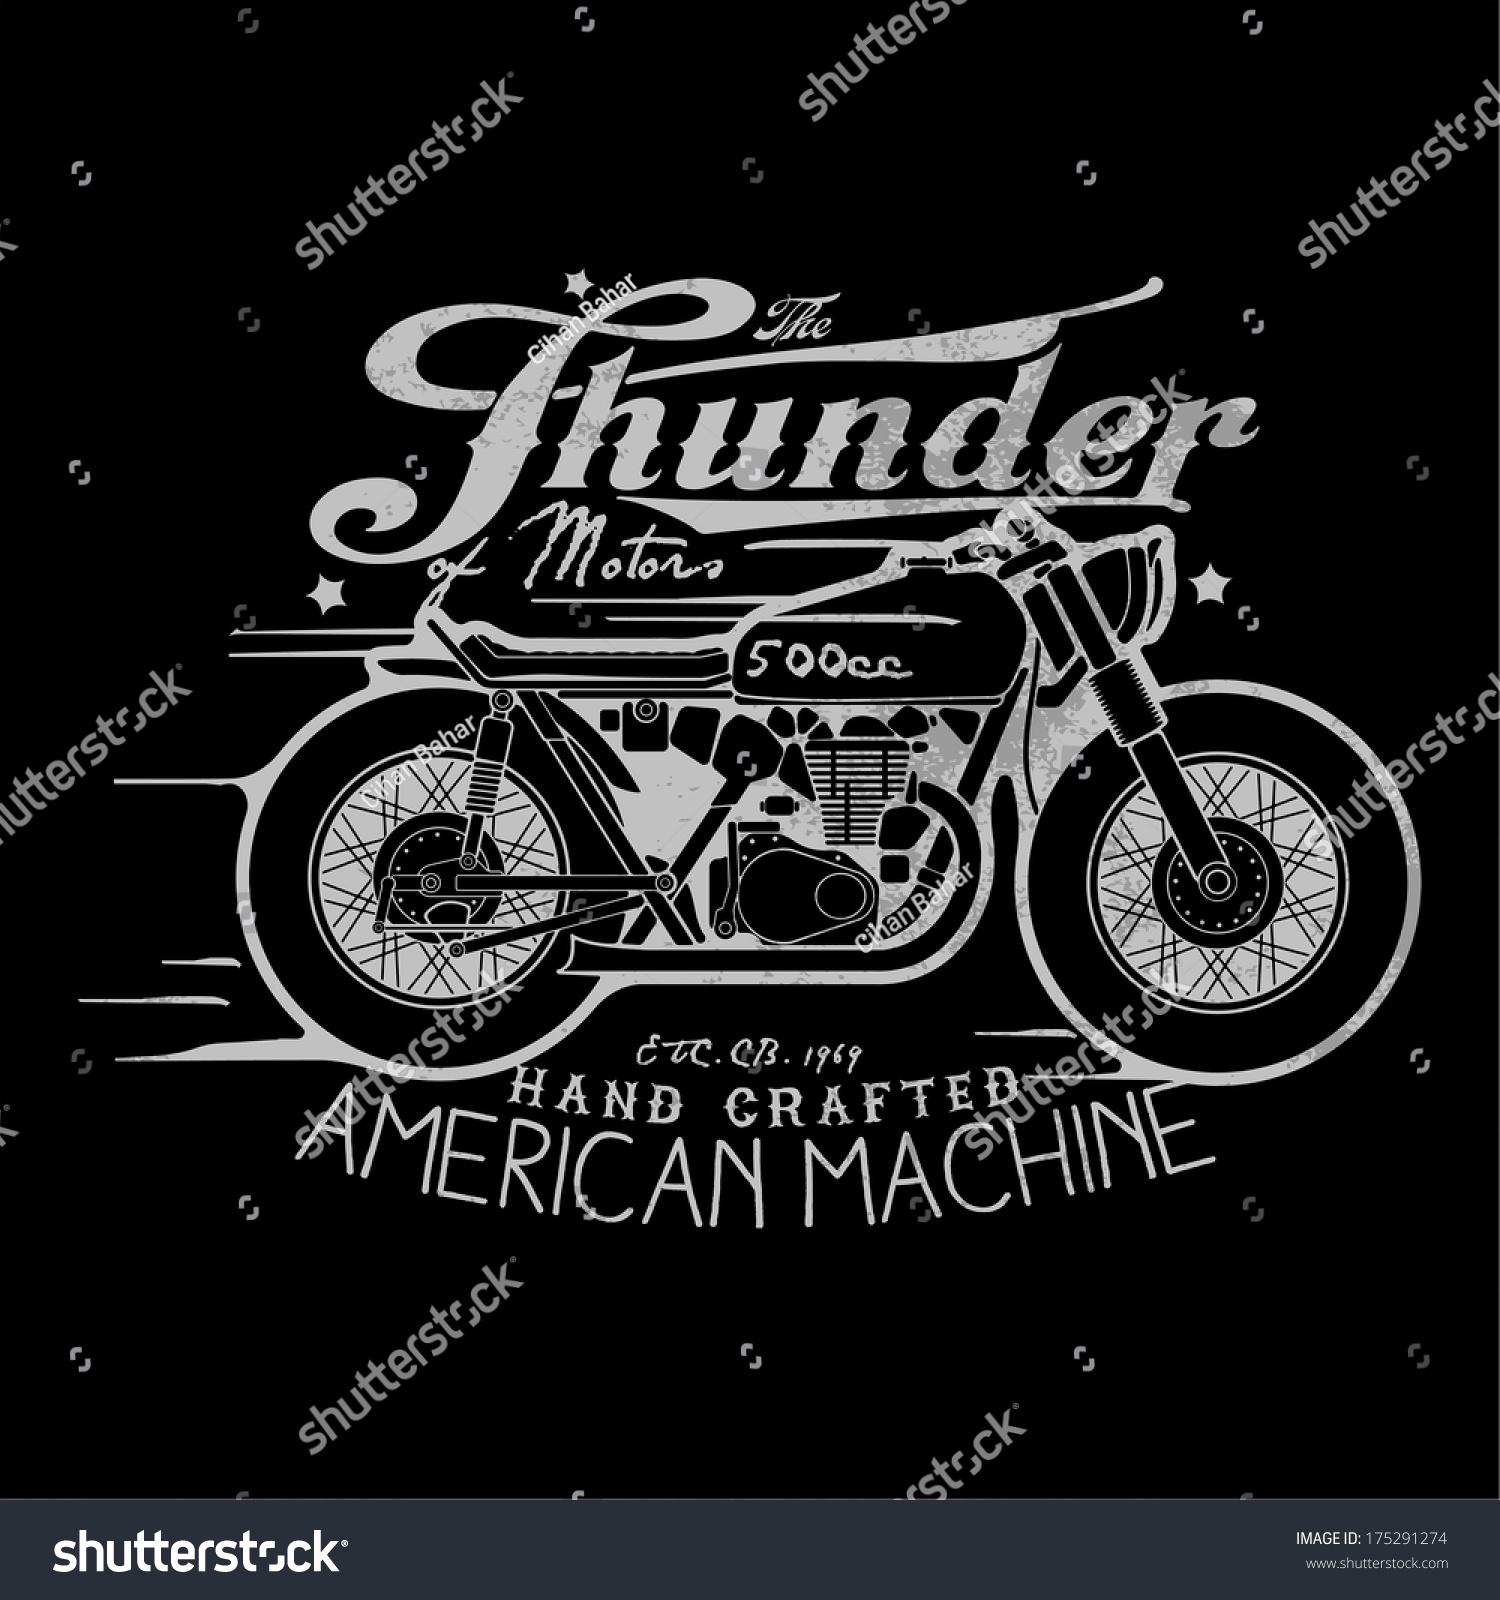 Shirt design printing - Motorcycle Themed T Shirt Printing Design